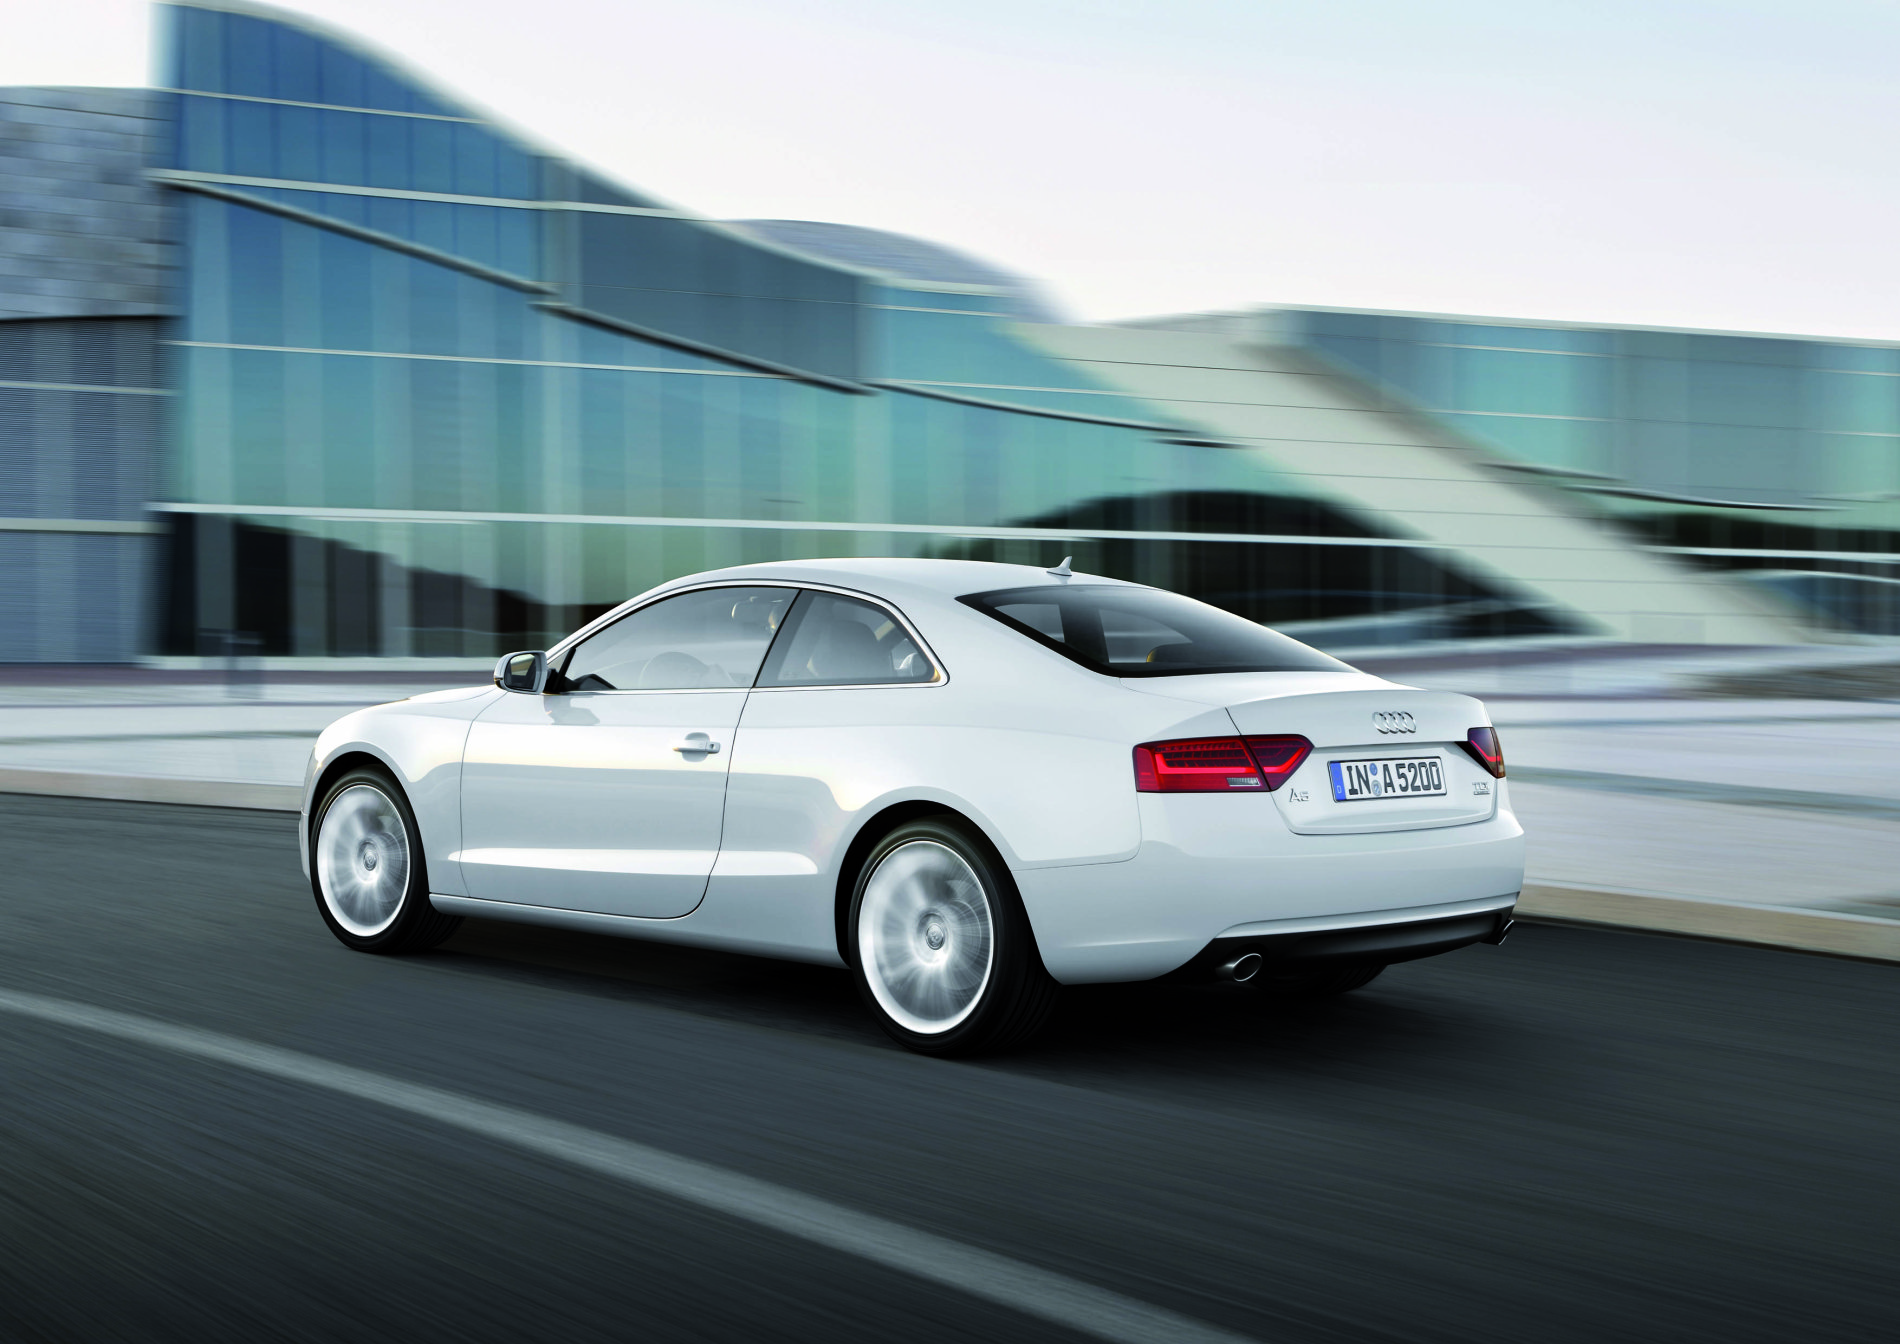 Audi A5 / S5 Coupe Facelift - Audi A5 / S5 Coupe Facelift